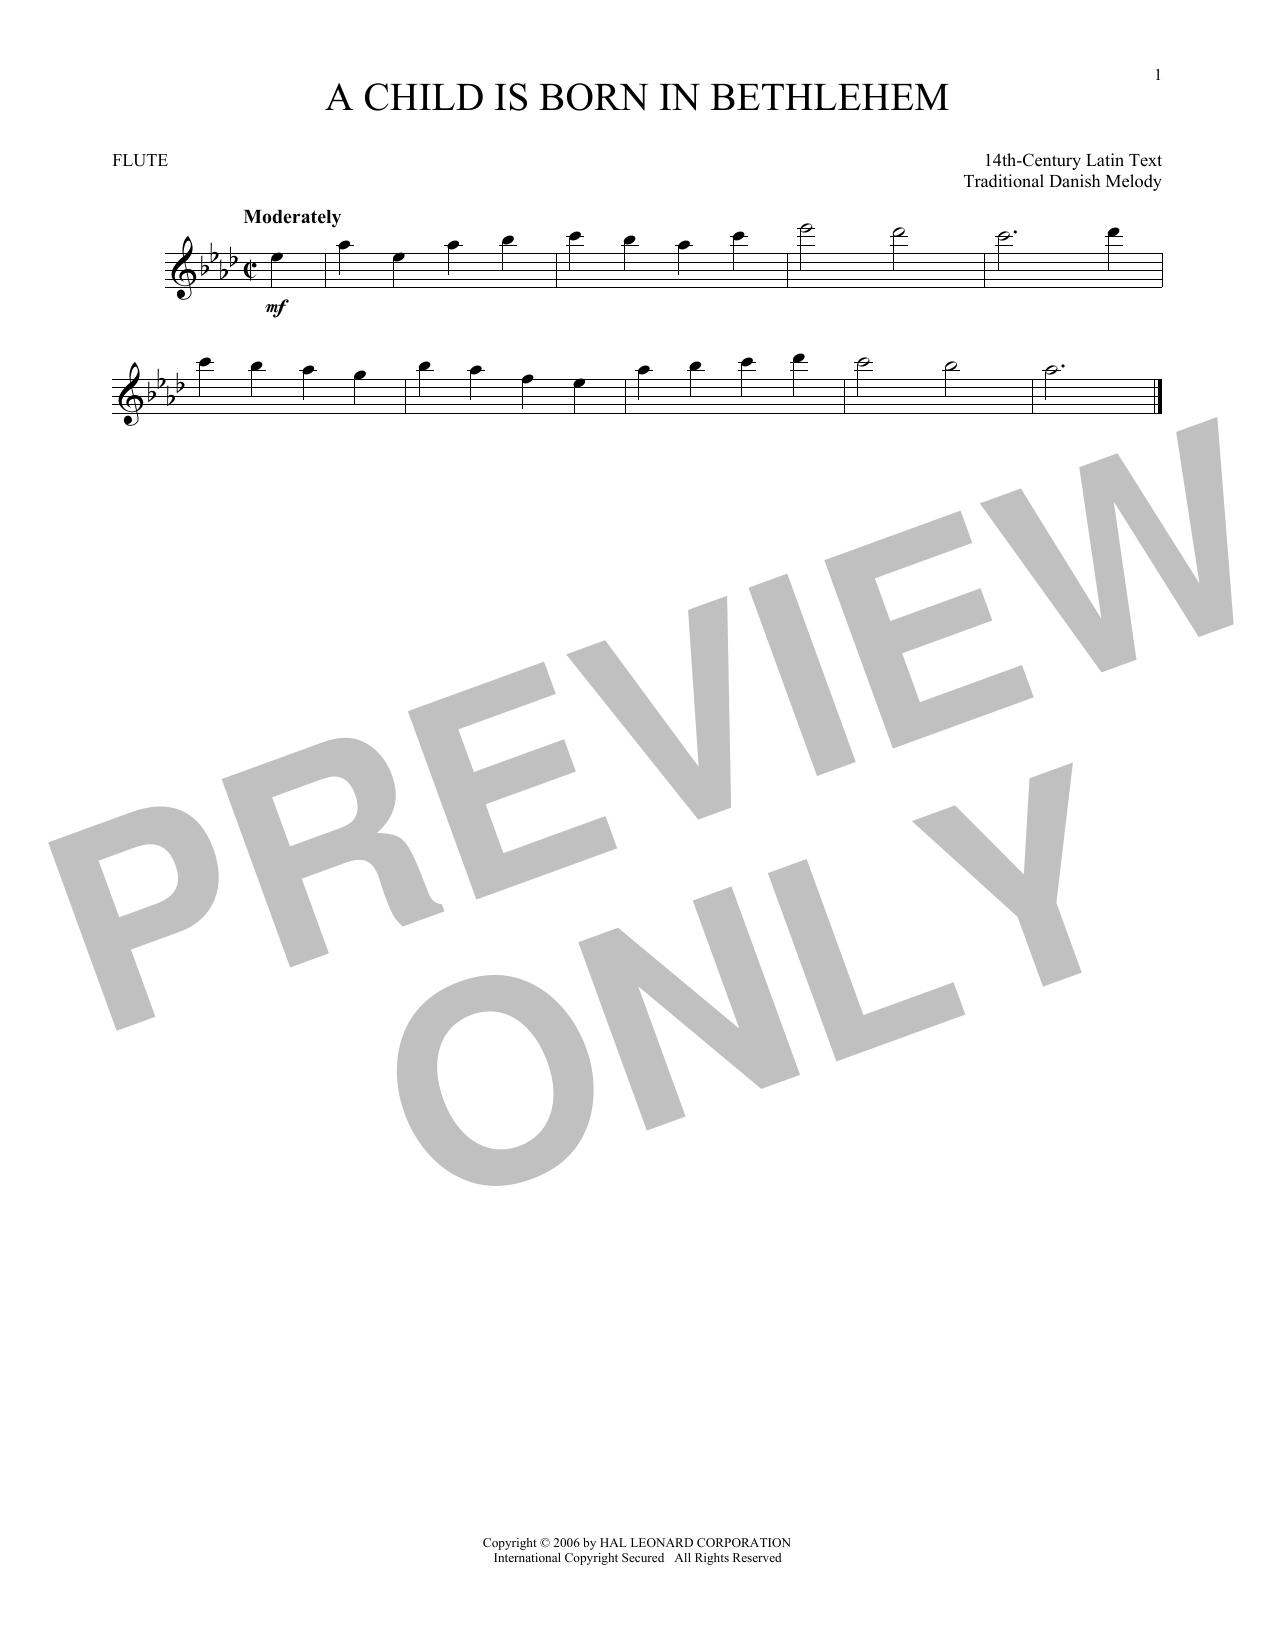 Partition flûte A Child Is Born In Bethlehem de Traditional Danish Melody - Flute traversiere